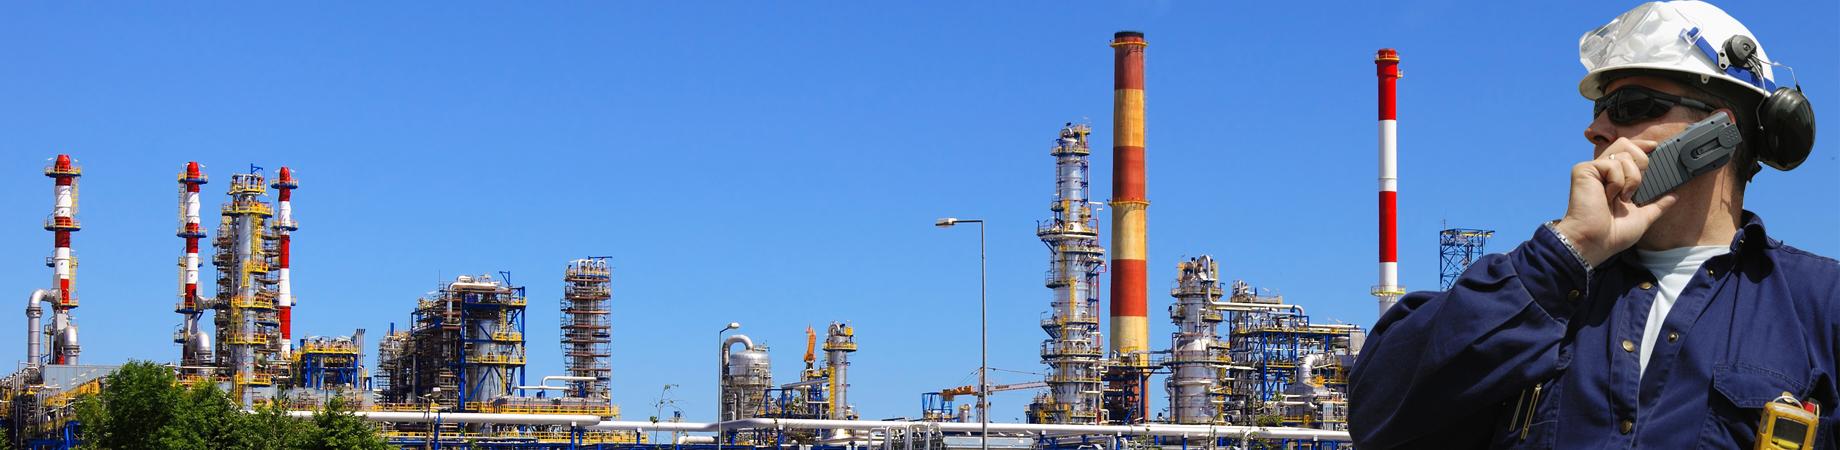 refinerySliderBG1